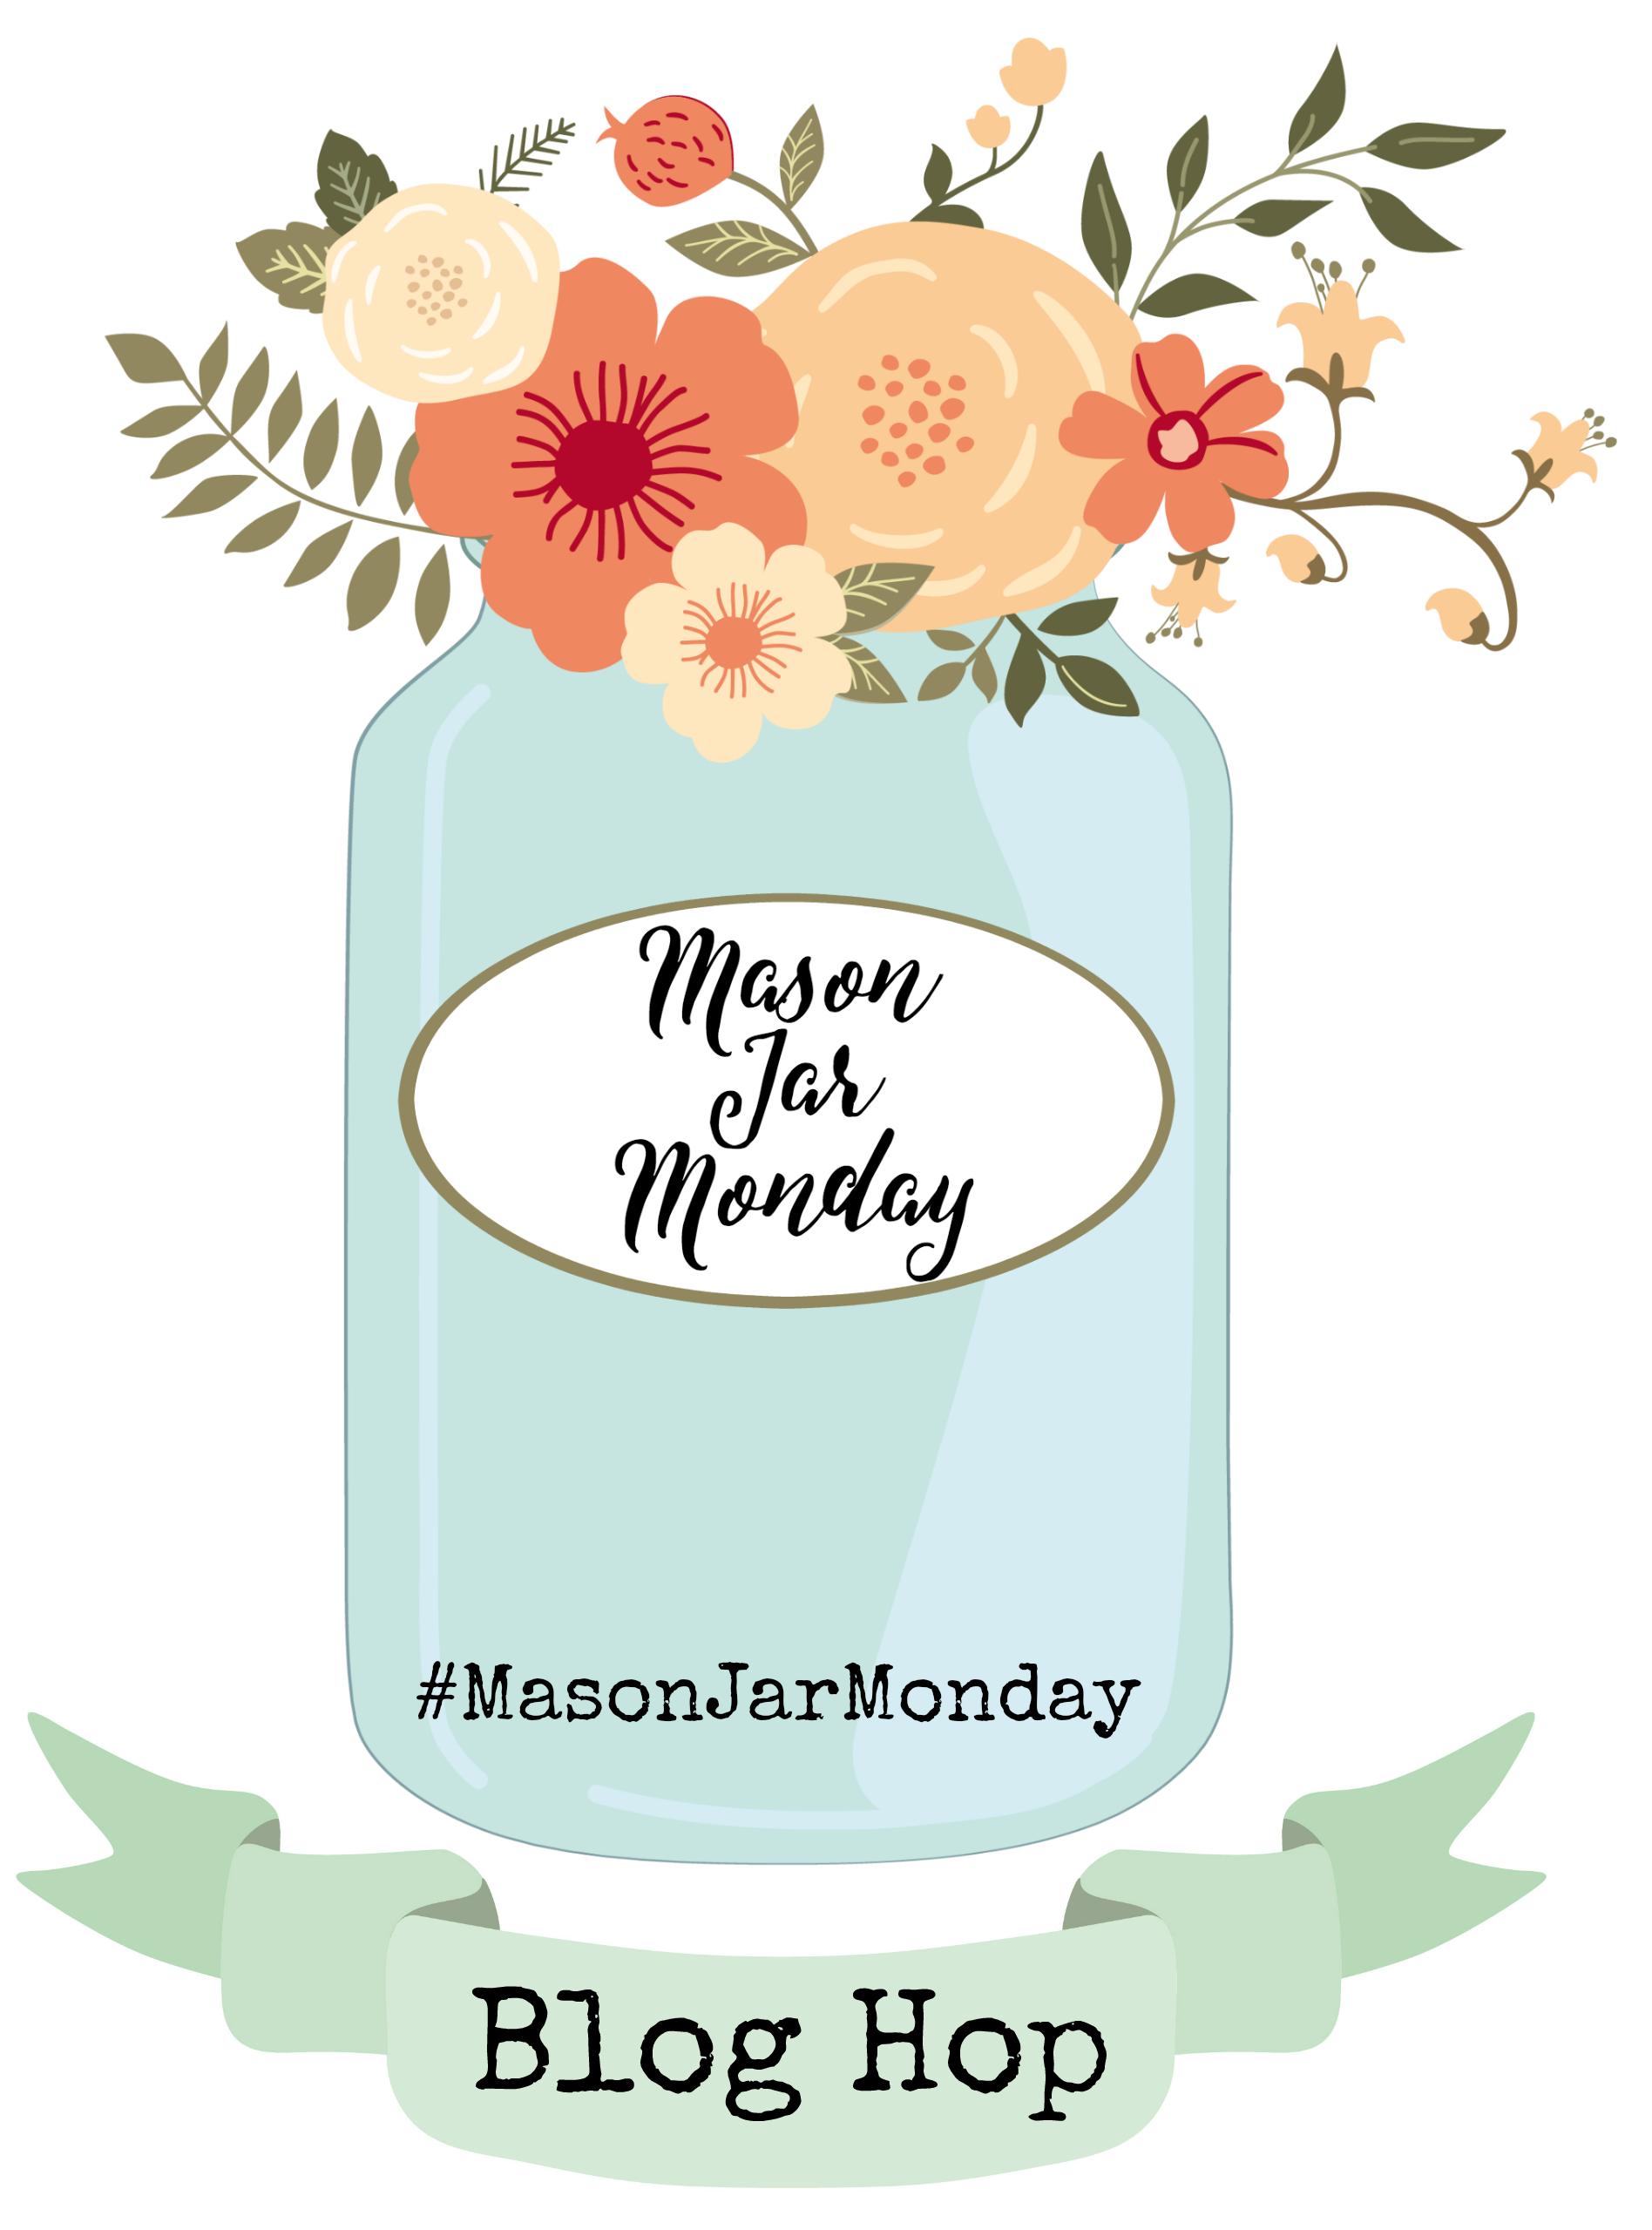 Mason Jar Monday